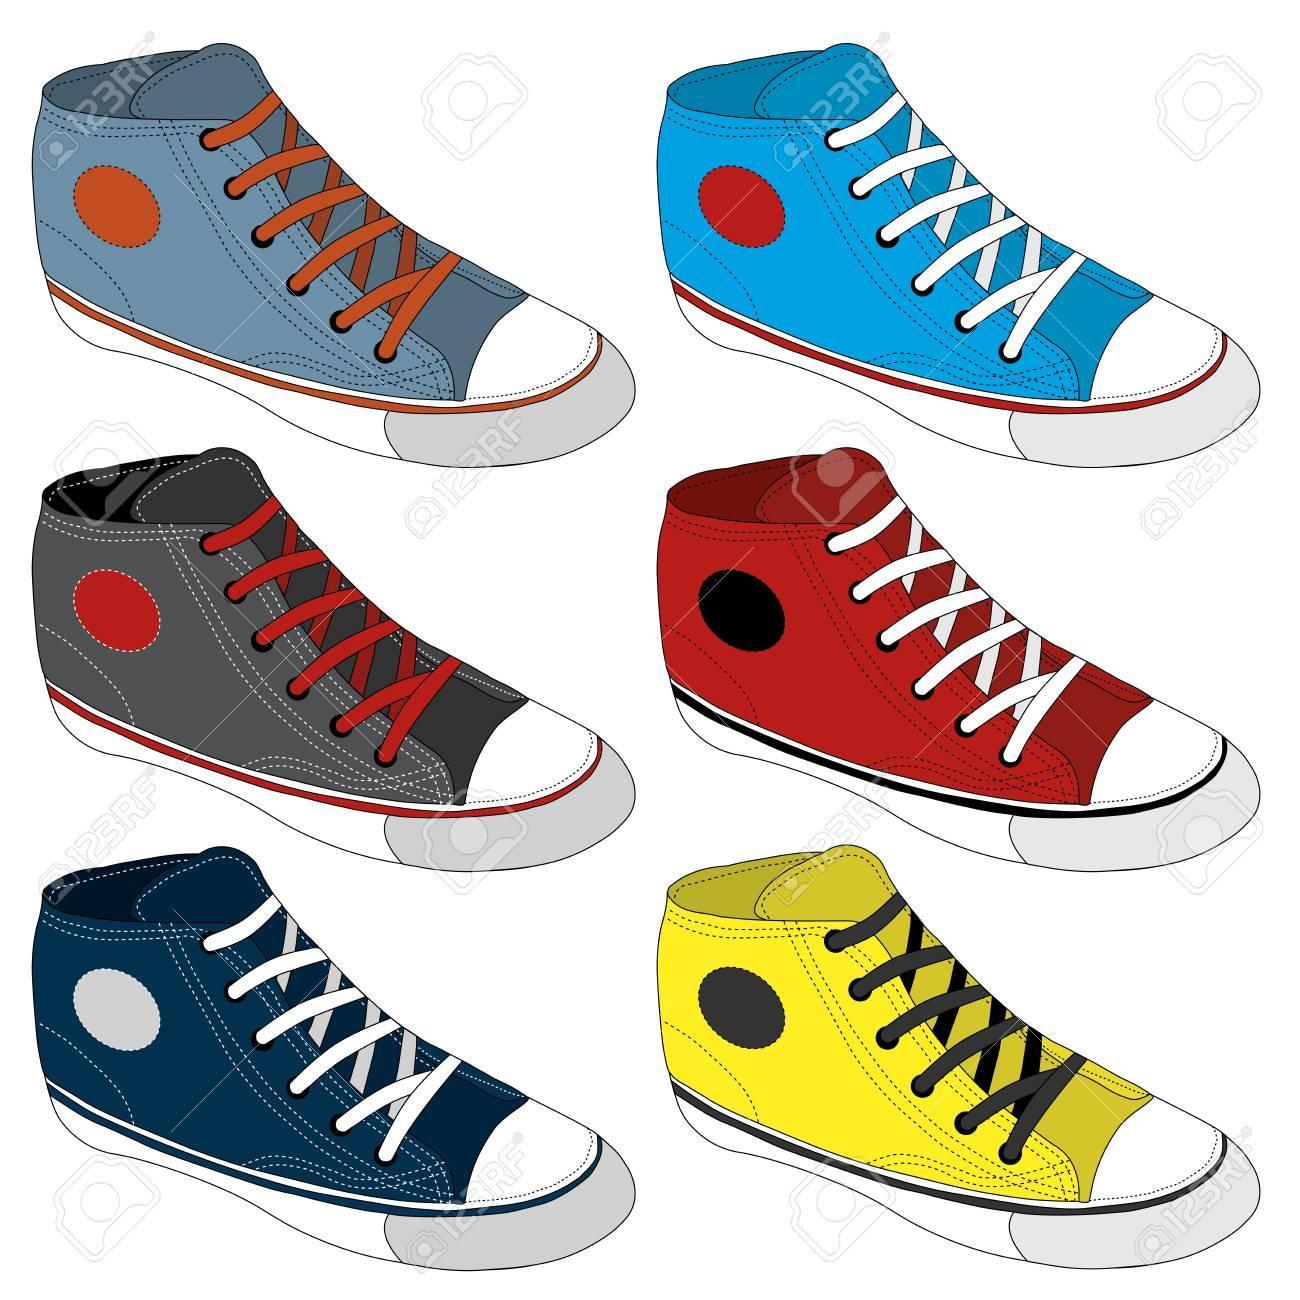 Diferentes En Zapatos O Zapatillas EditableConjunto Zapatilla EsbozadoVectorCompletamente De Deporte Iconos Clásico 5j34ALR